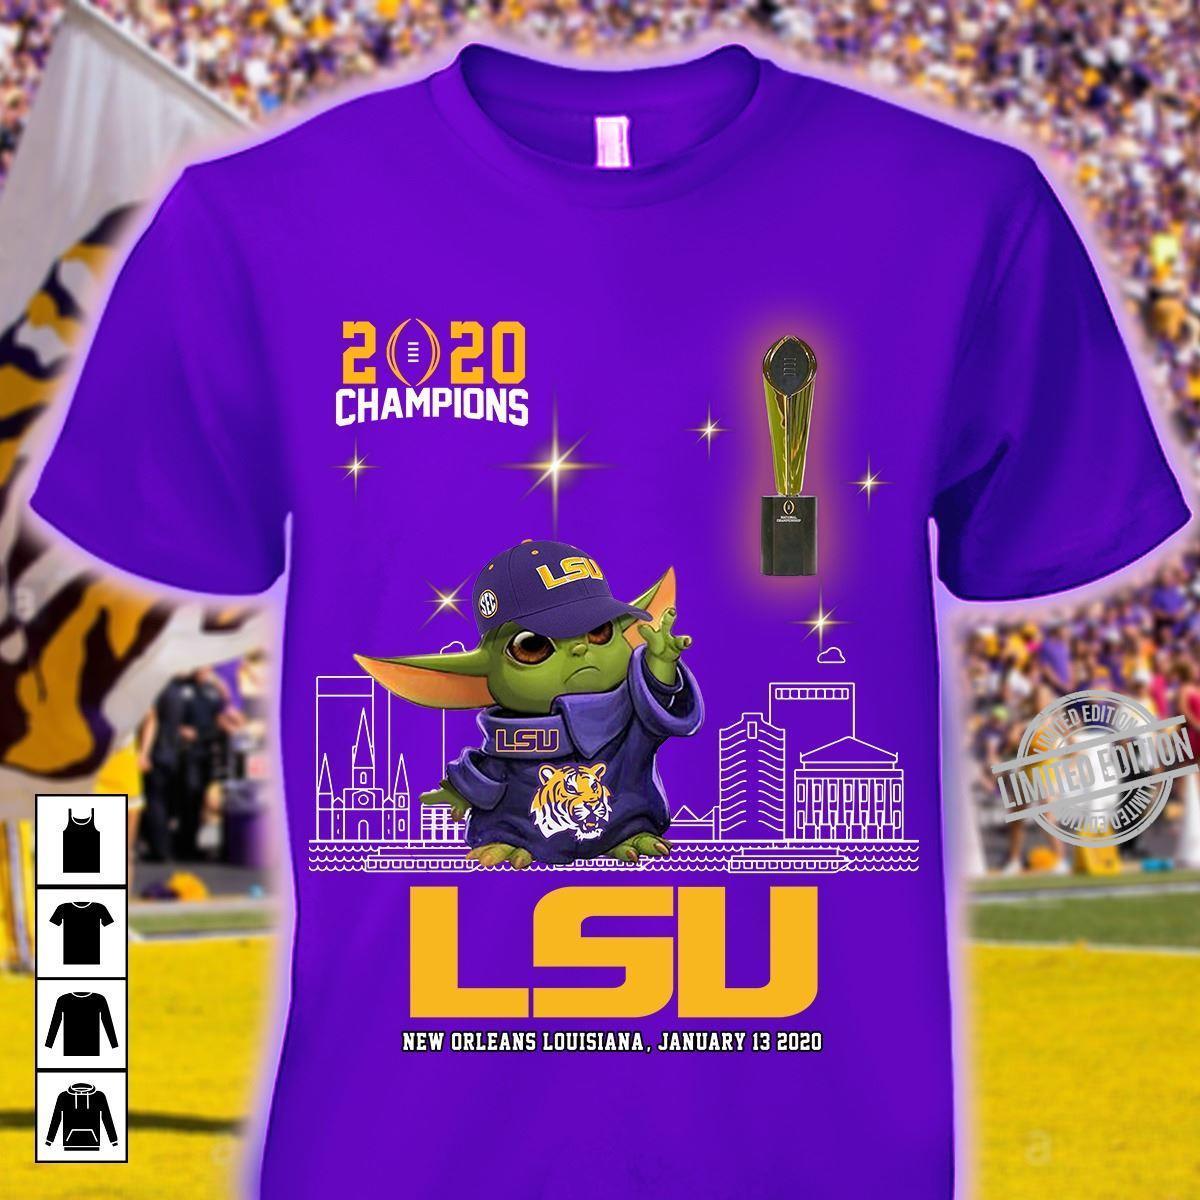 2020 Champions Baby Yoda LSU New Orleans Louisiana Shirt